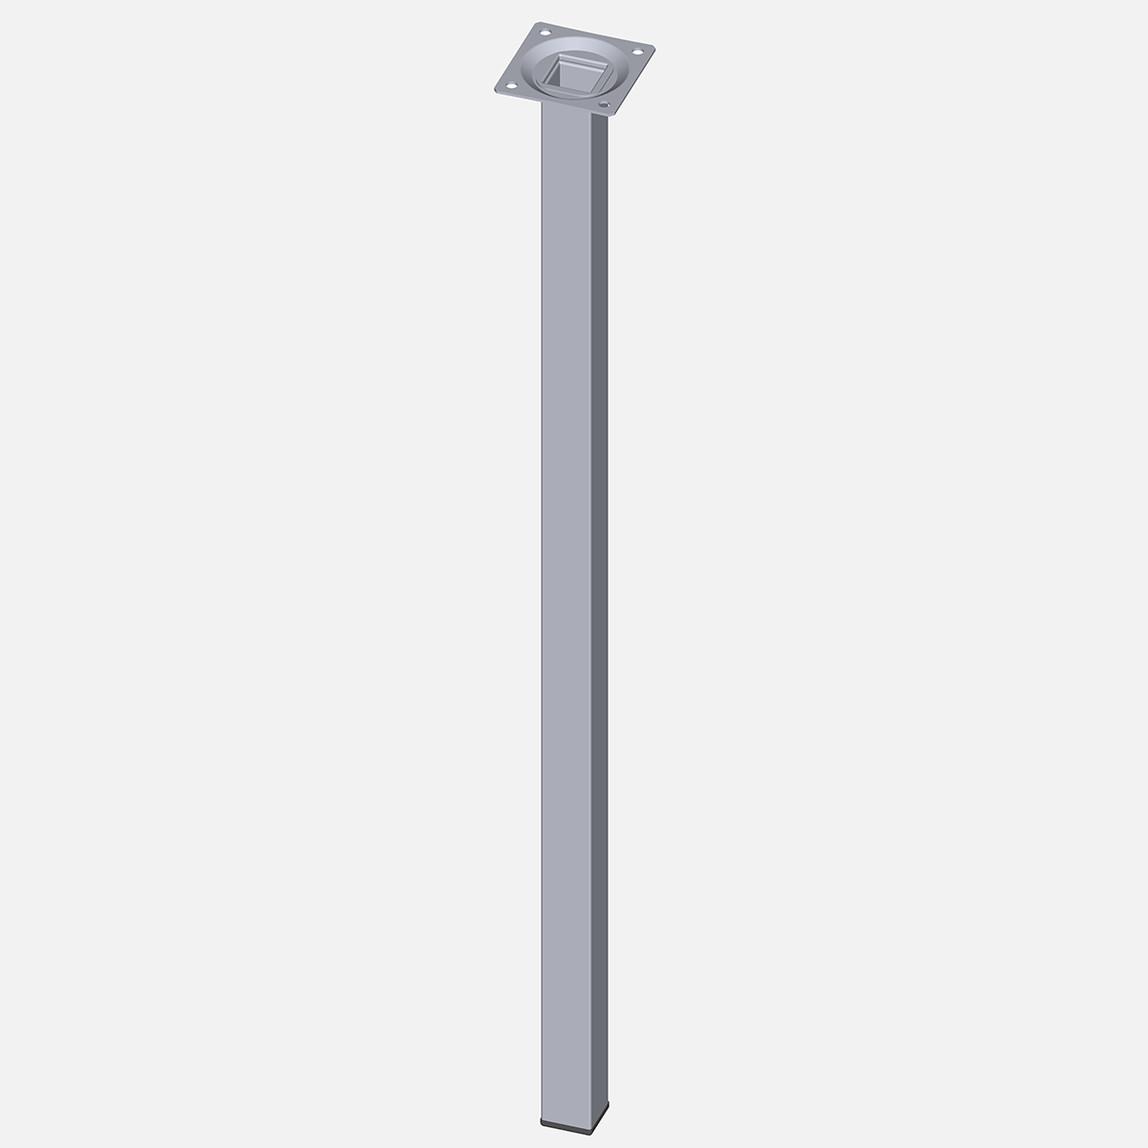 Masa Ayağı, Çelik boru kare, 600mm, krom